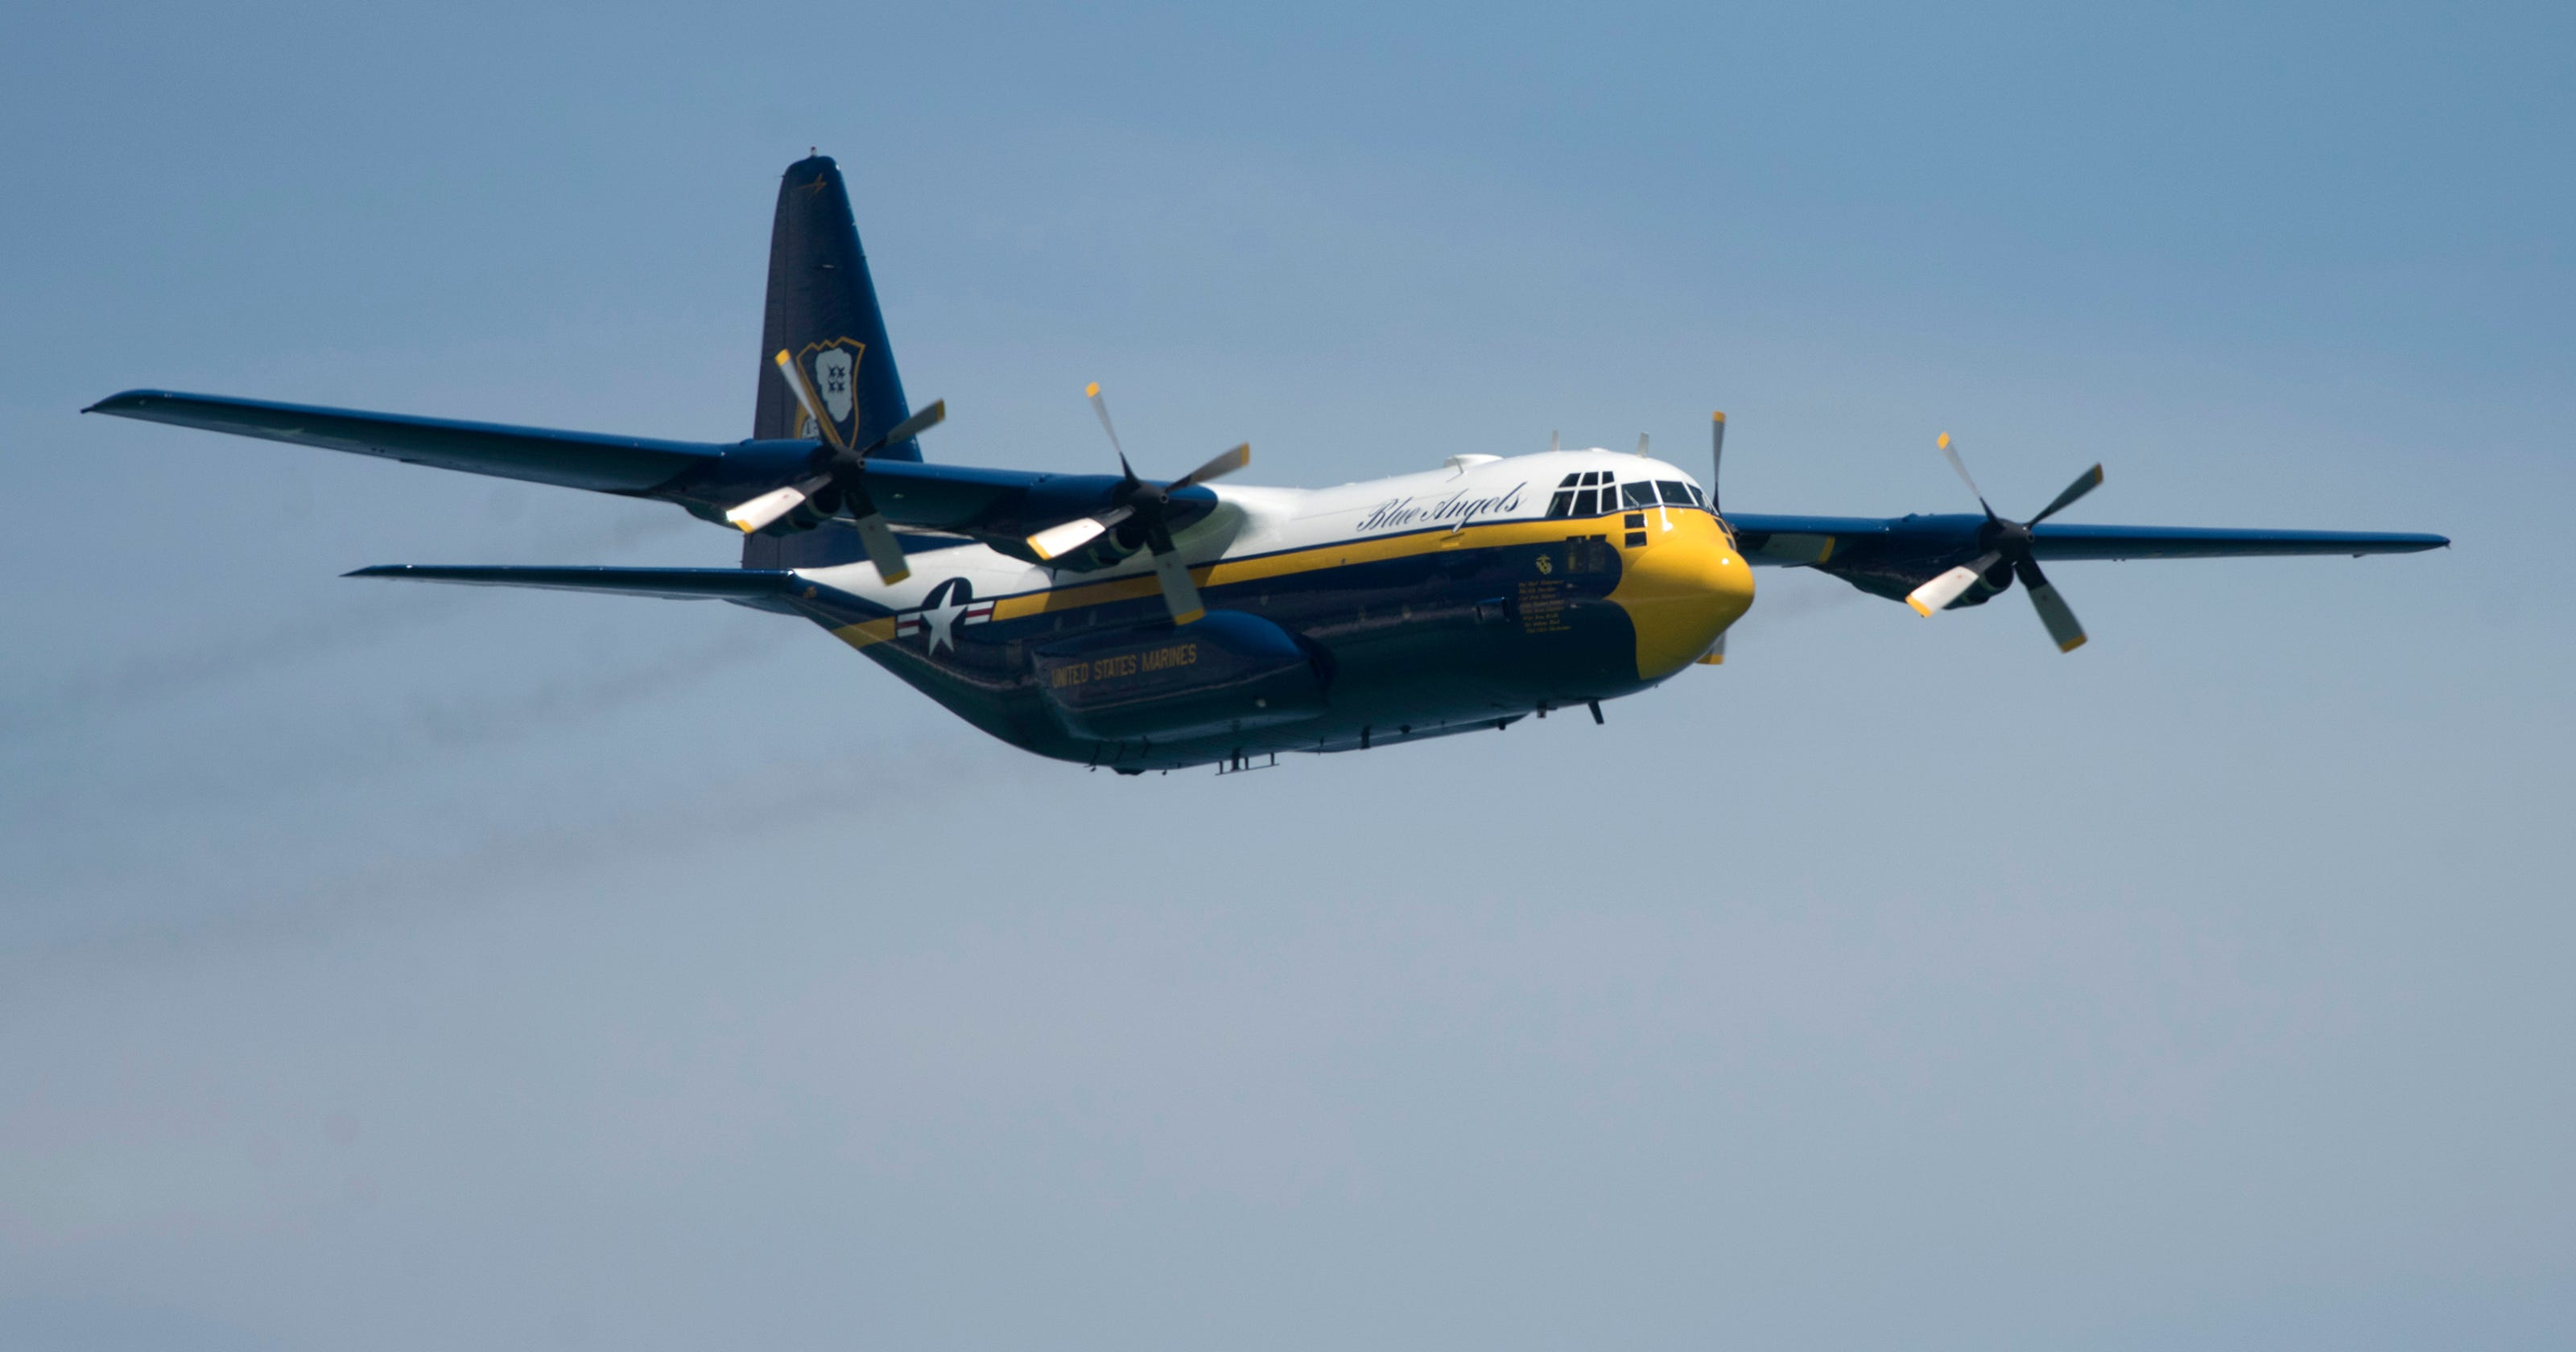 Blue Angels retire beloved Fat Albert after more than 30,000 flight hours